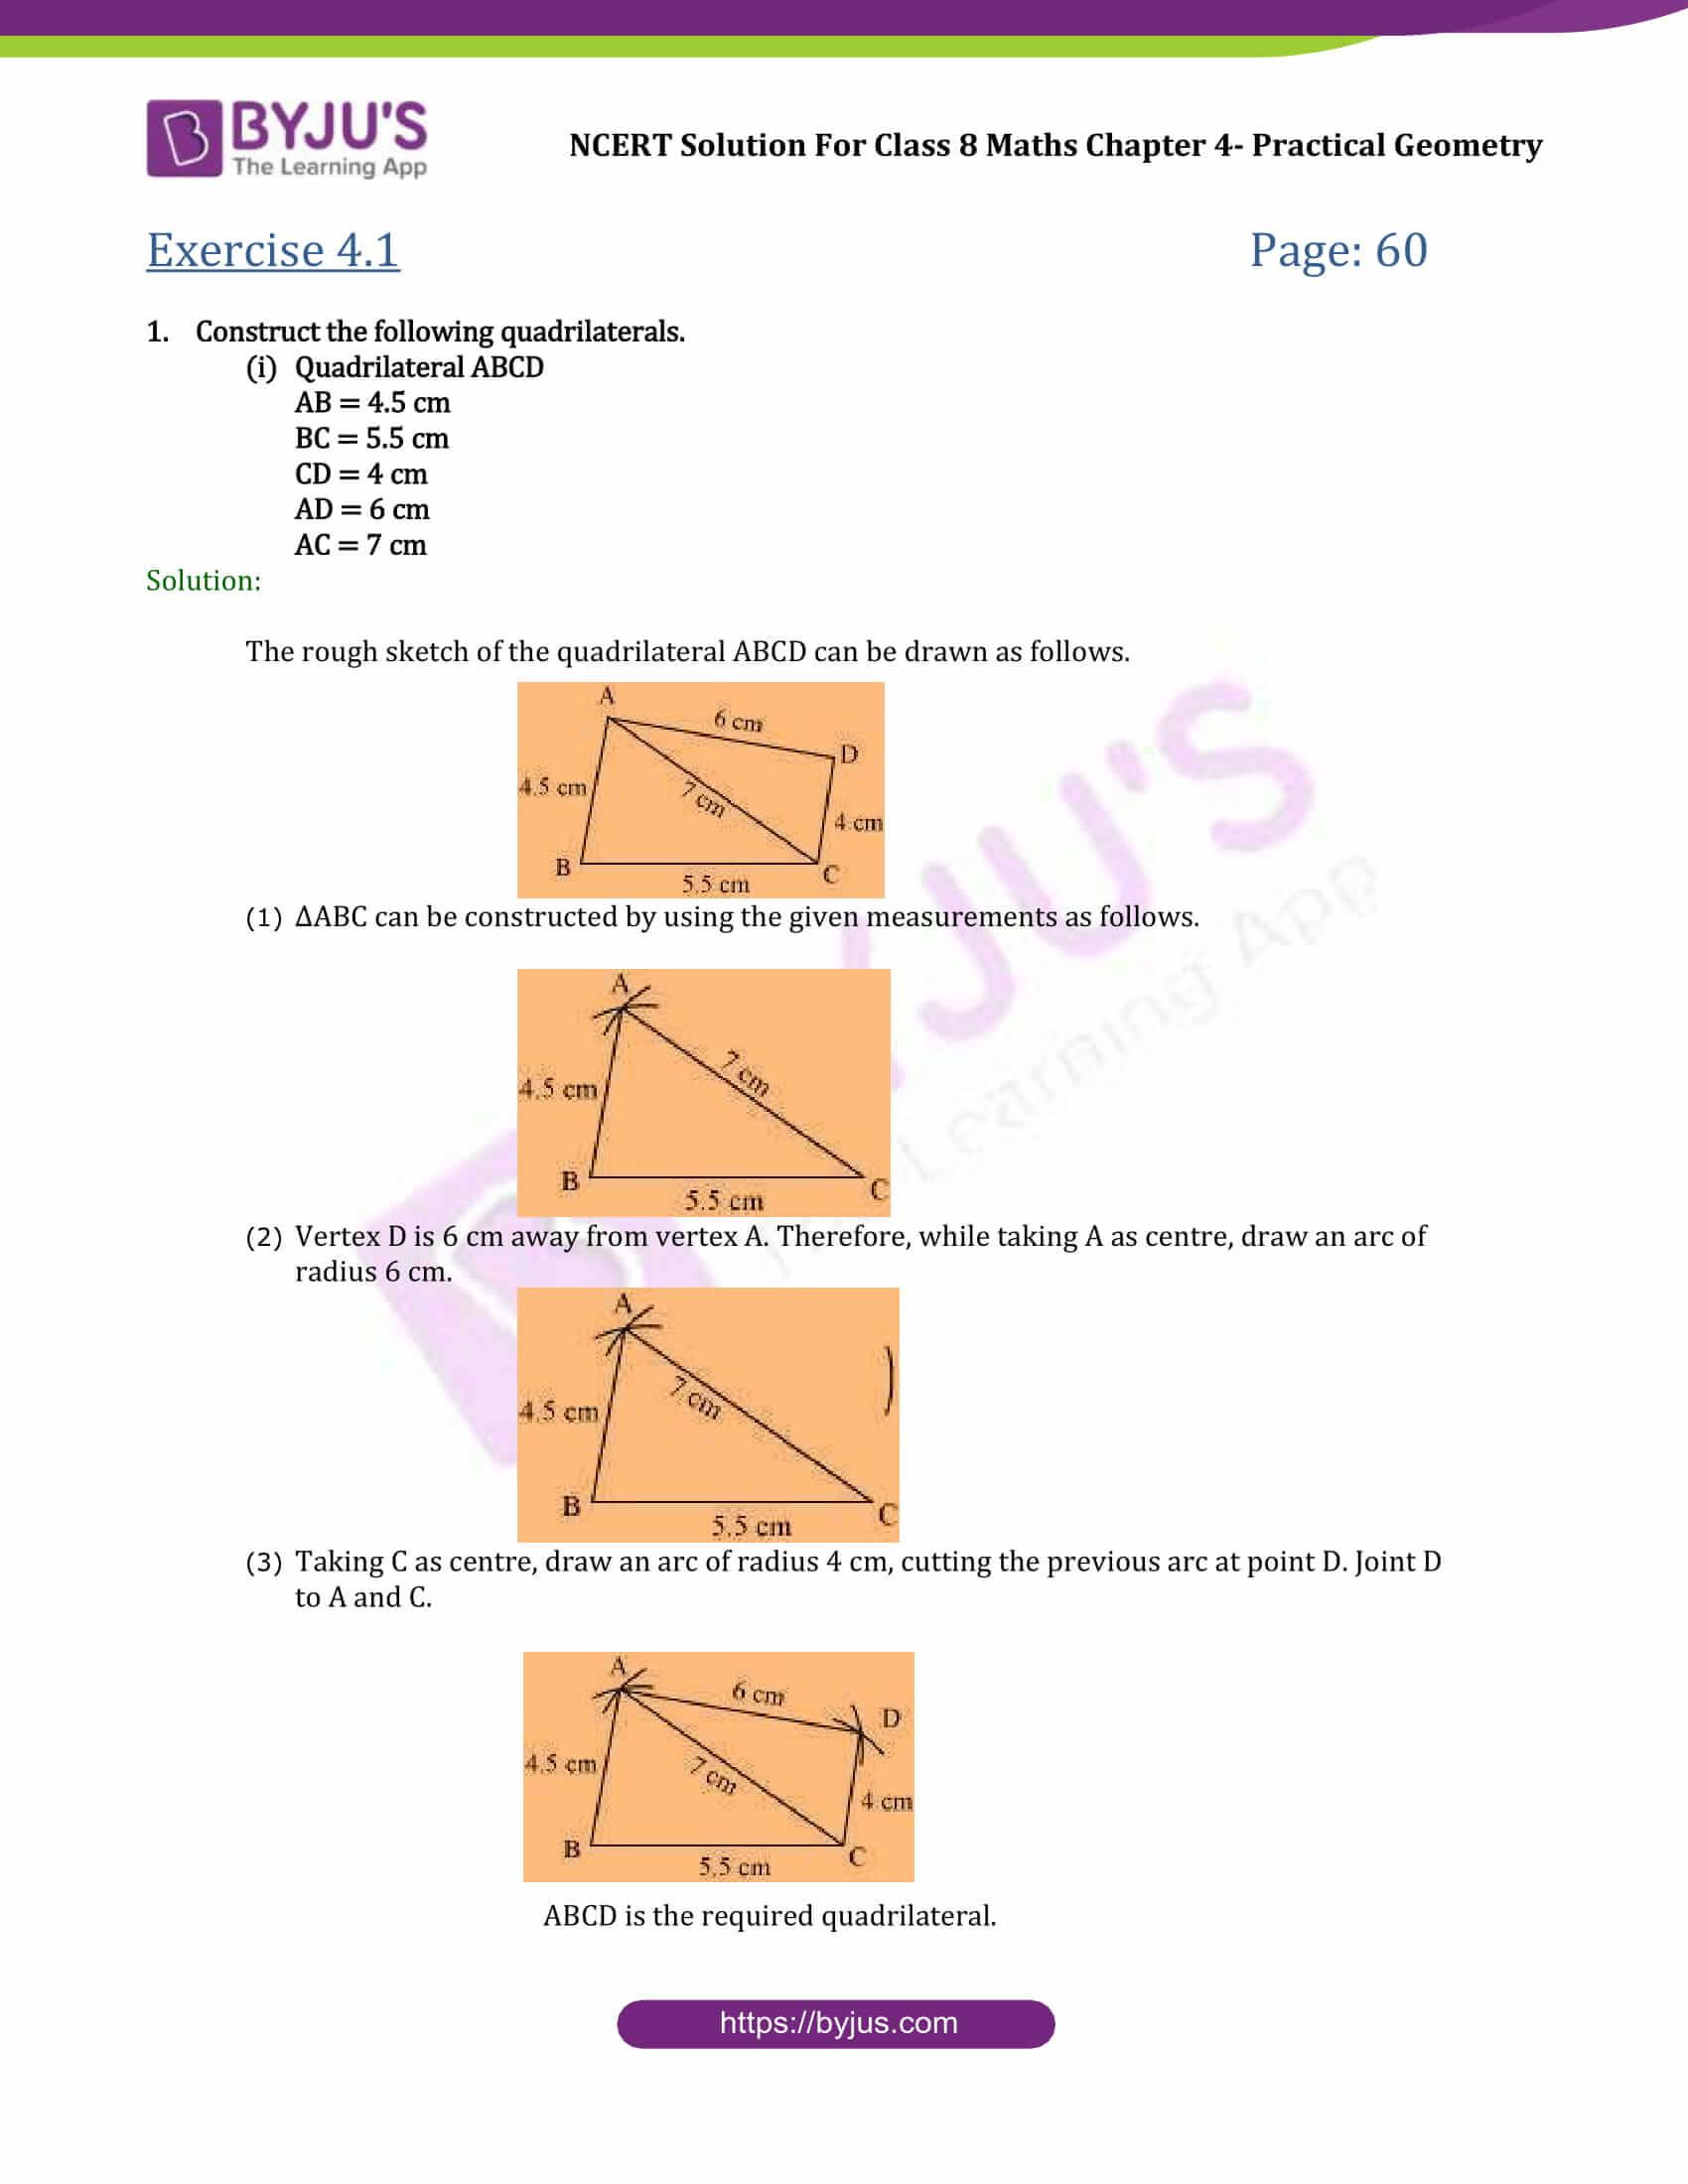 NCERT Solutions Class 8 Maths Chapter 4 Practical Geometry ...